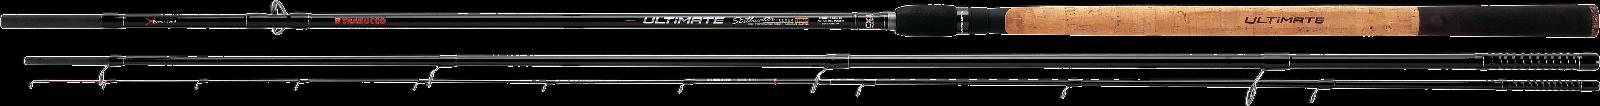 TRABUCCO ULTIMATE STILLWATER FEEDER 13ft 3.90m MP 90gr. autobon Feeder asta